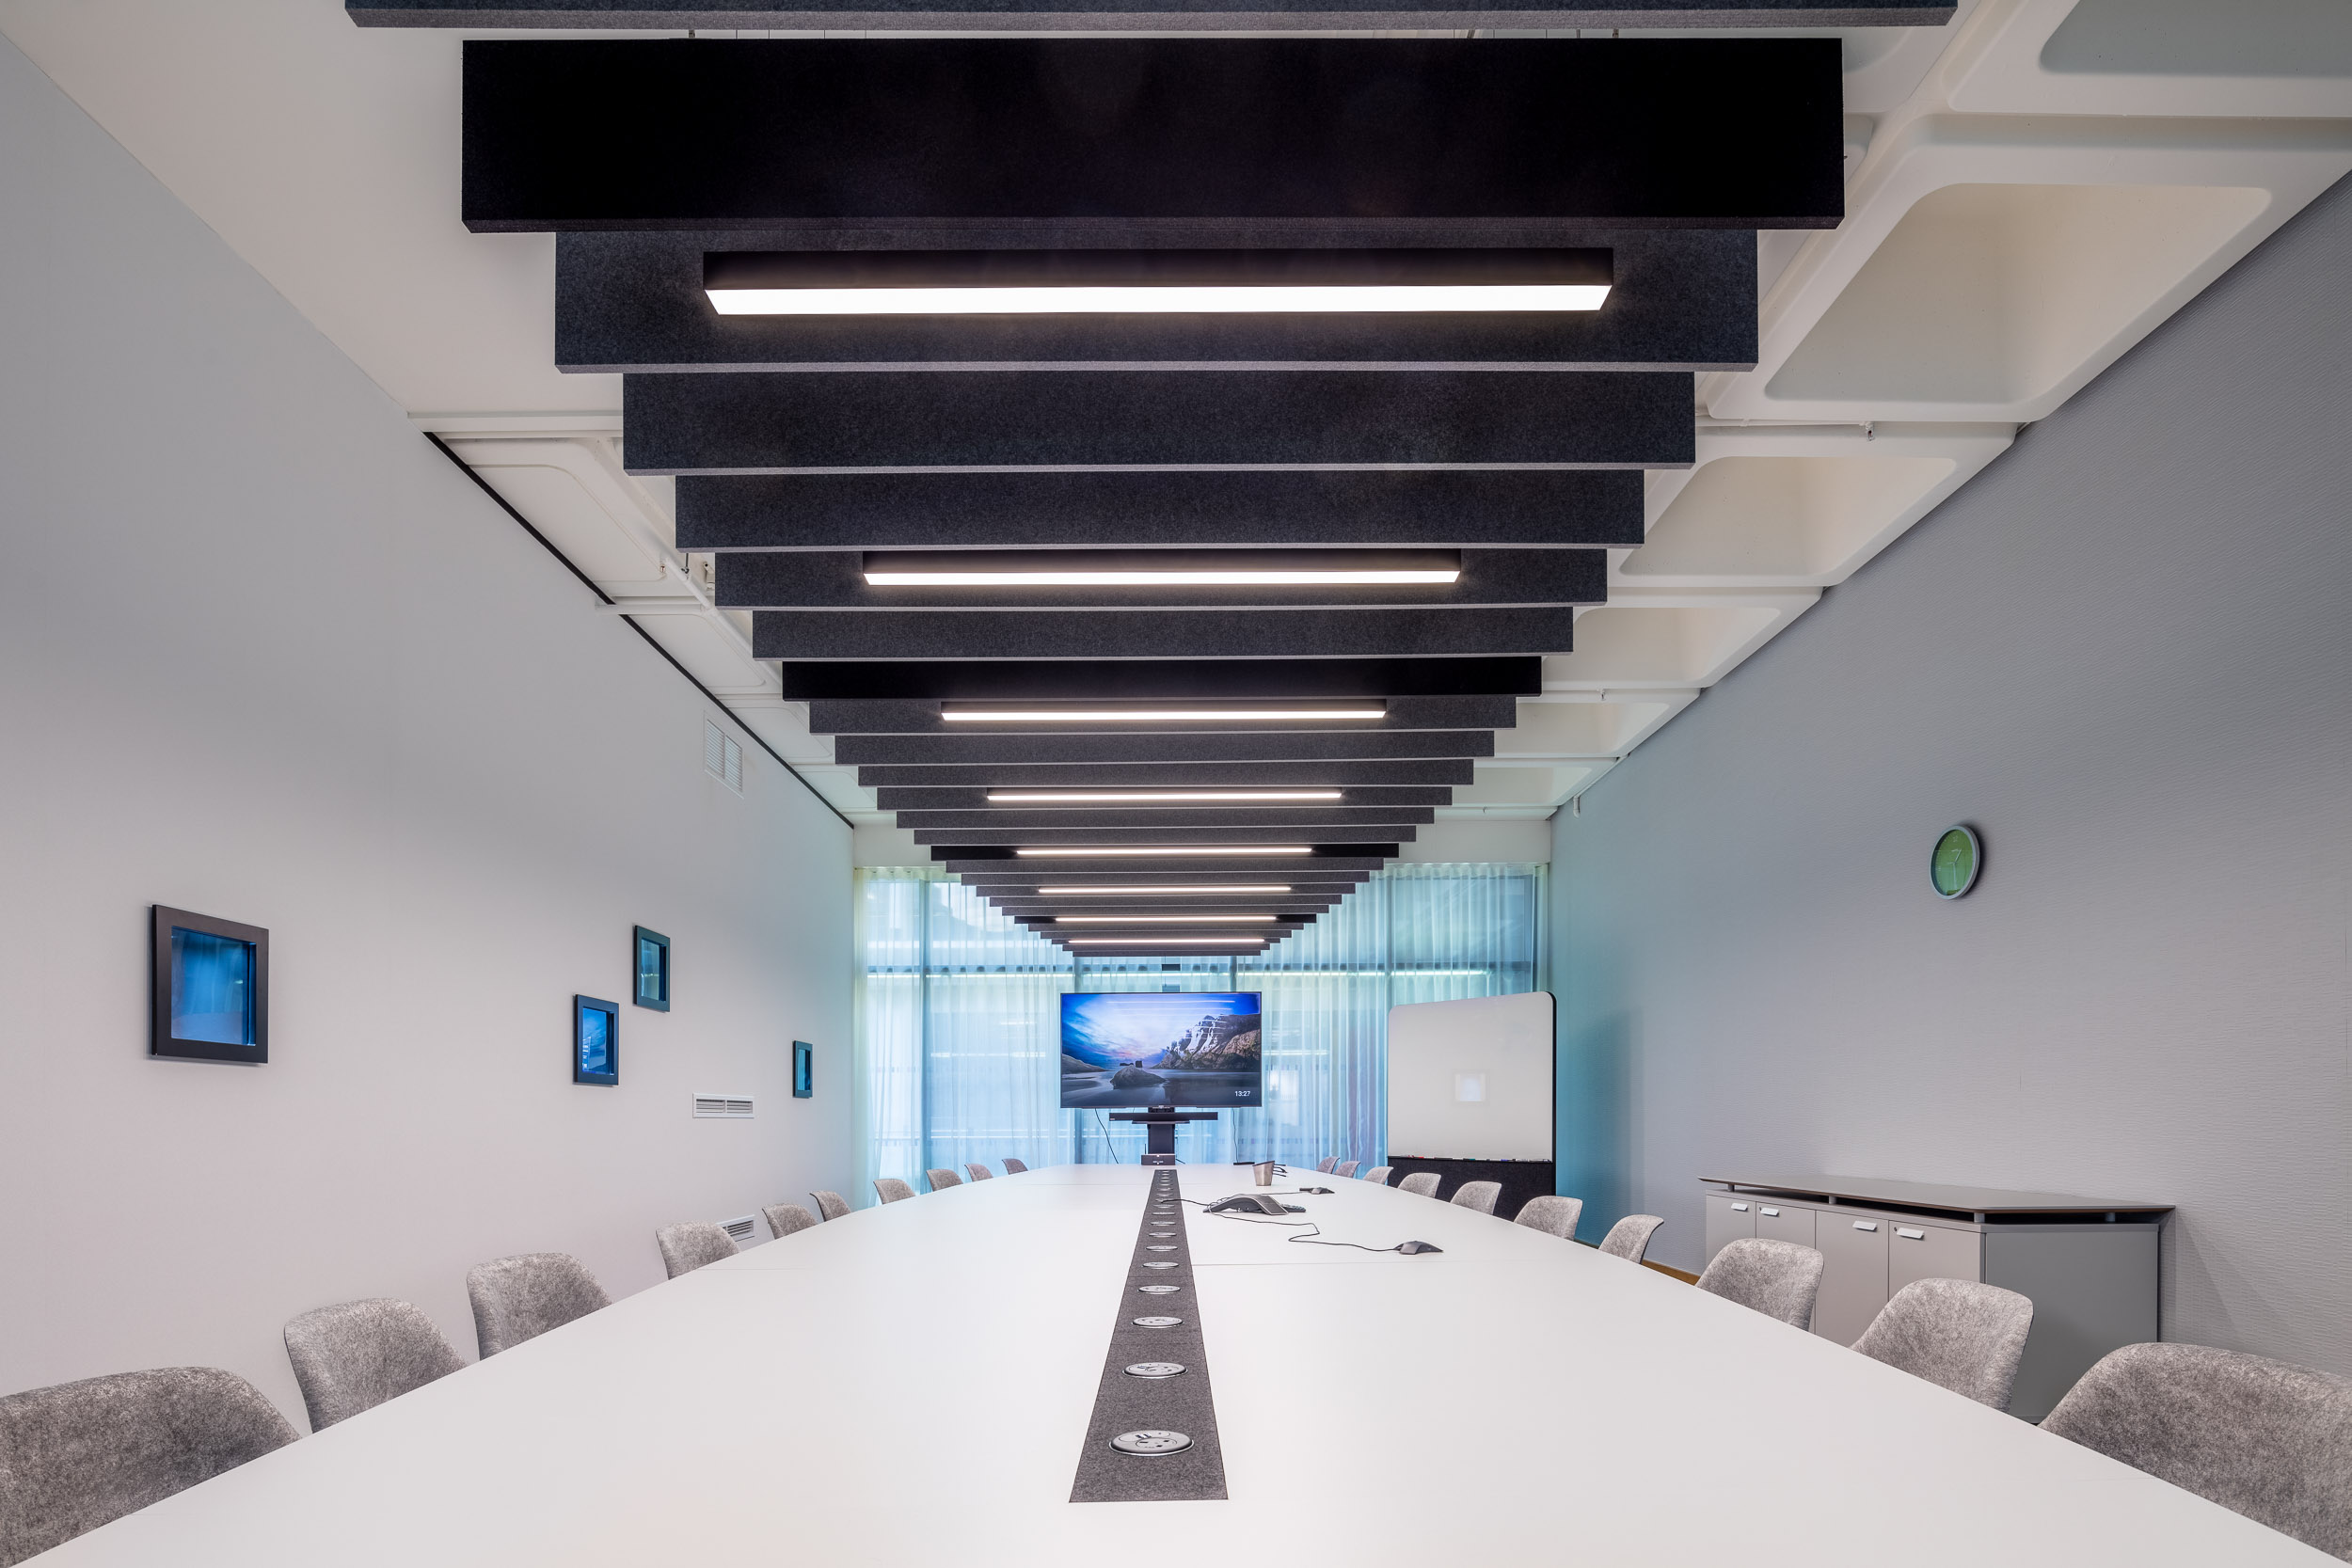 office acoustics 1.jpg